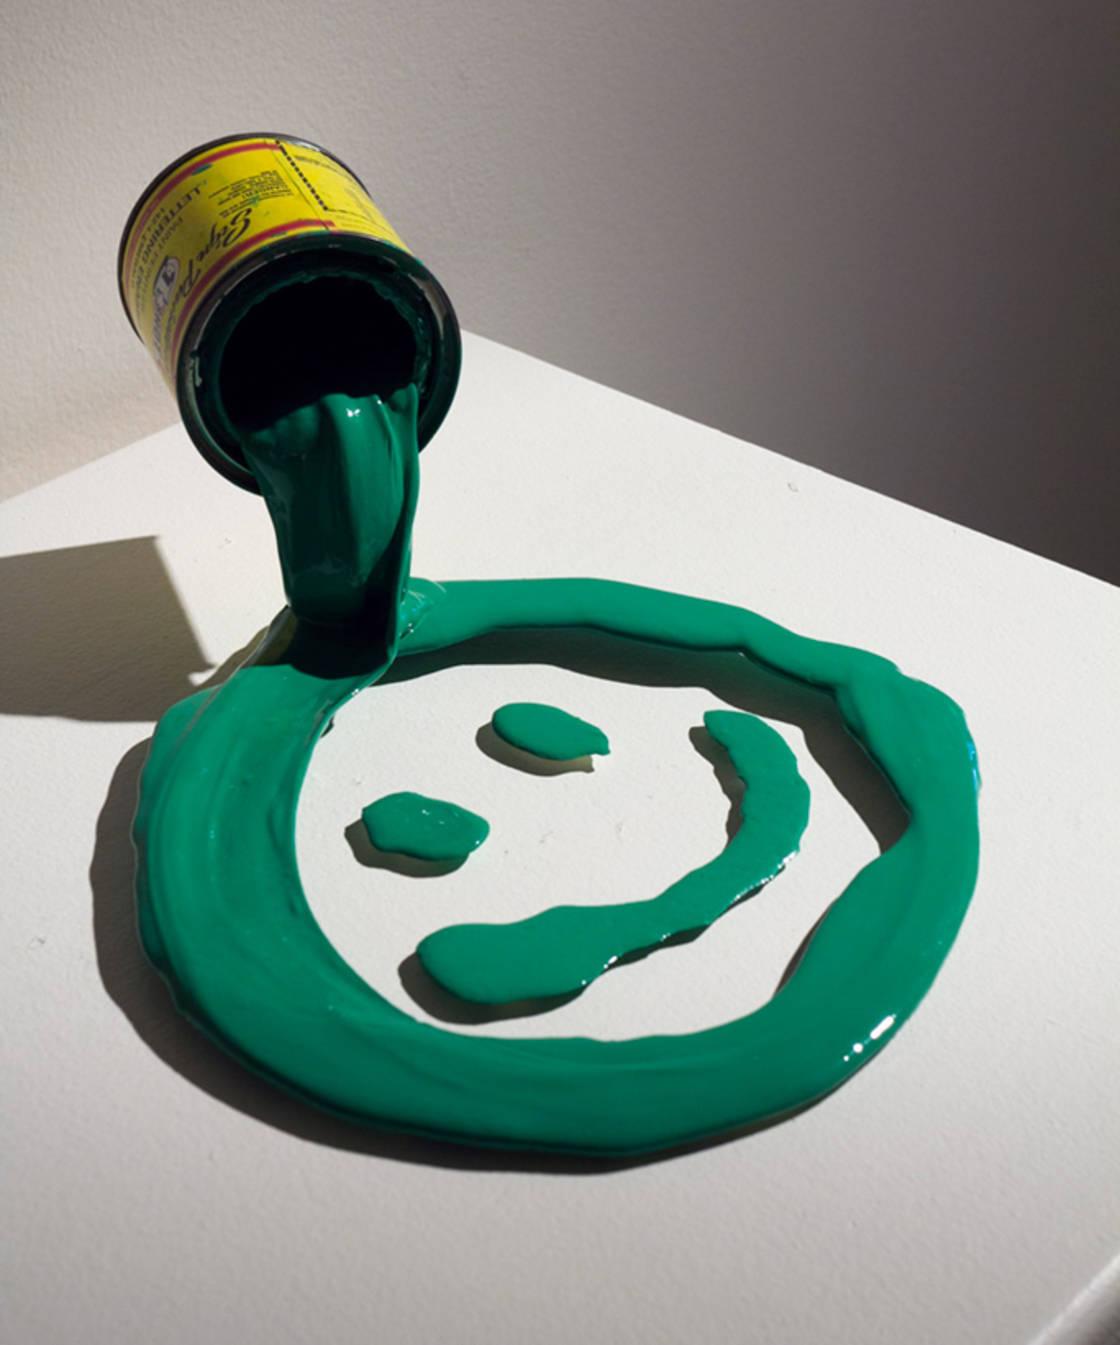 Pop Culture - The colorful dripping sculptures of Joe Suzuki